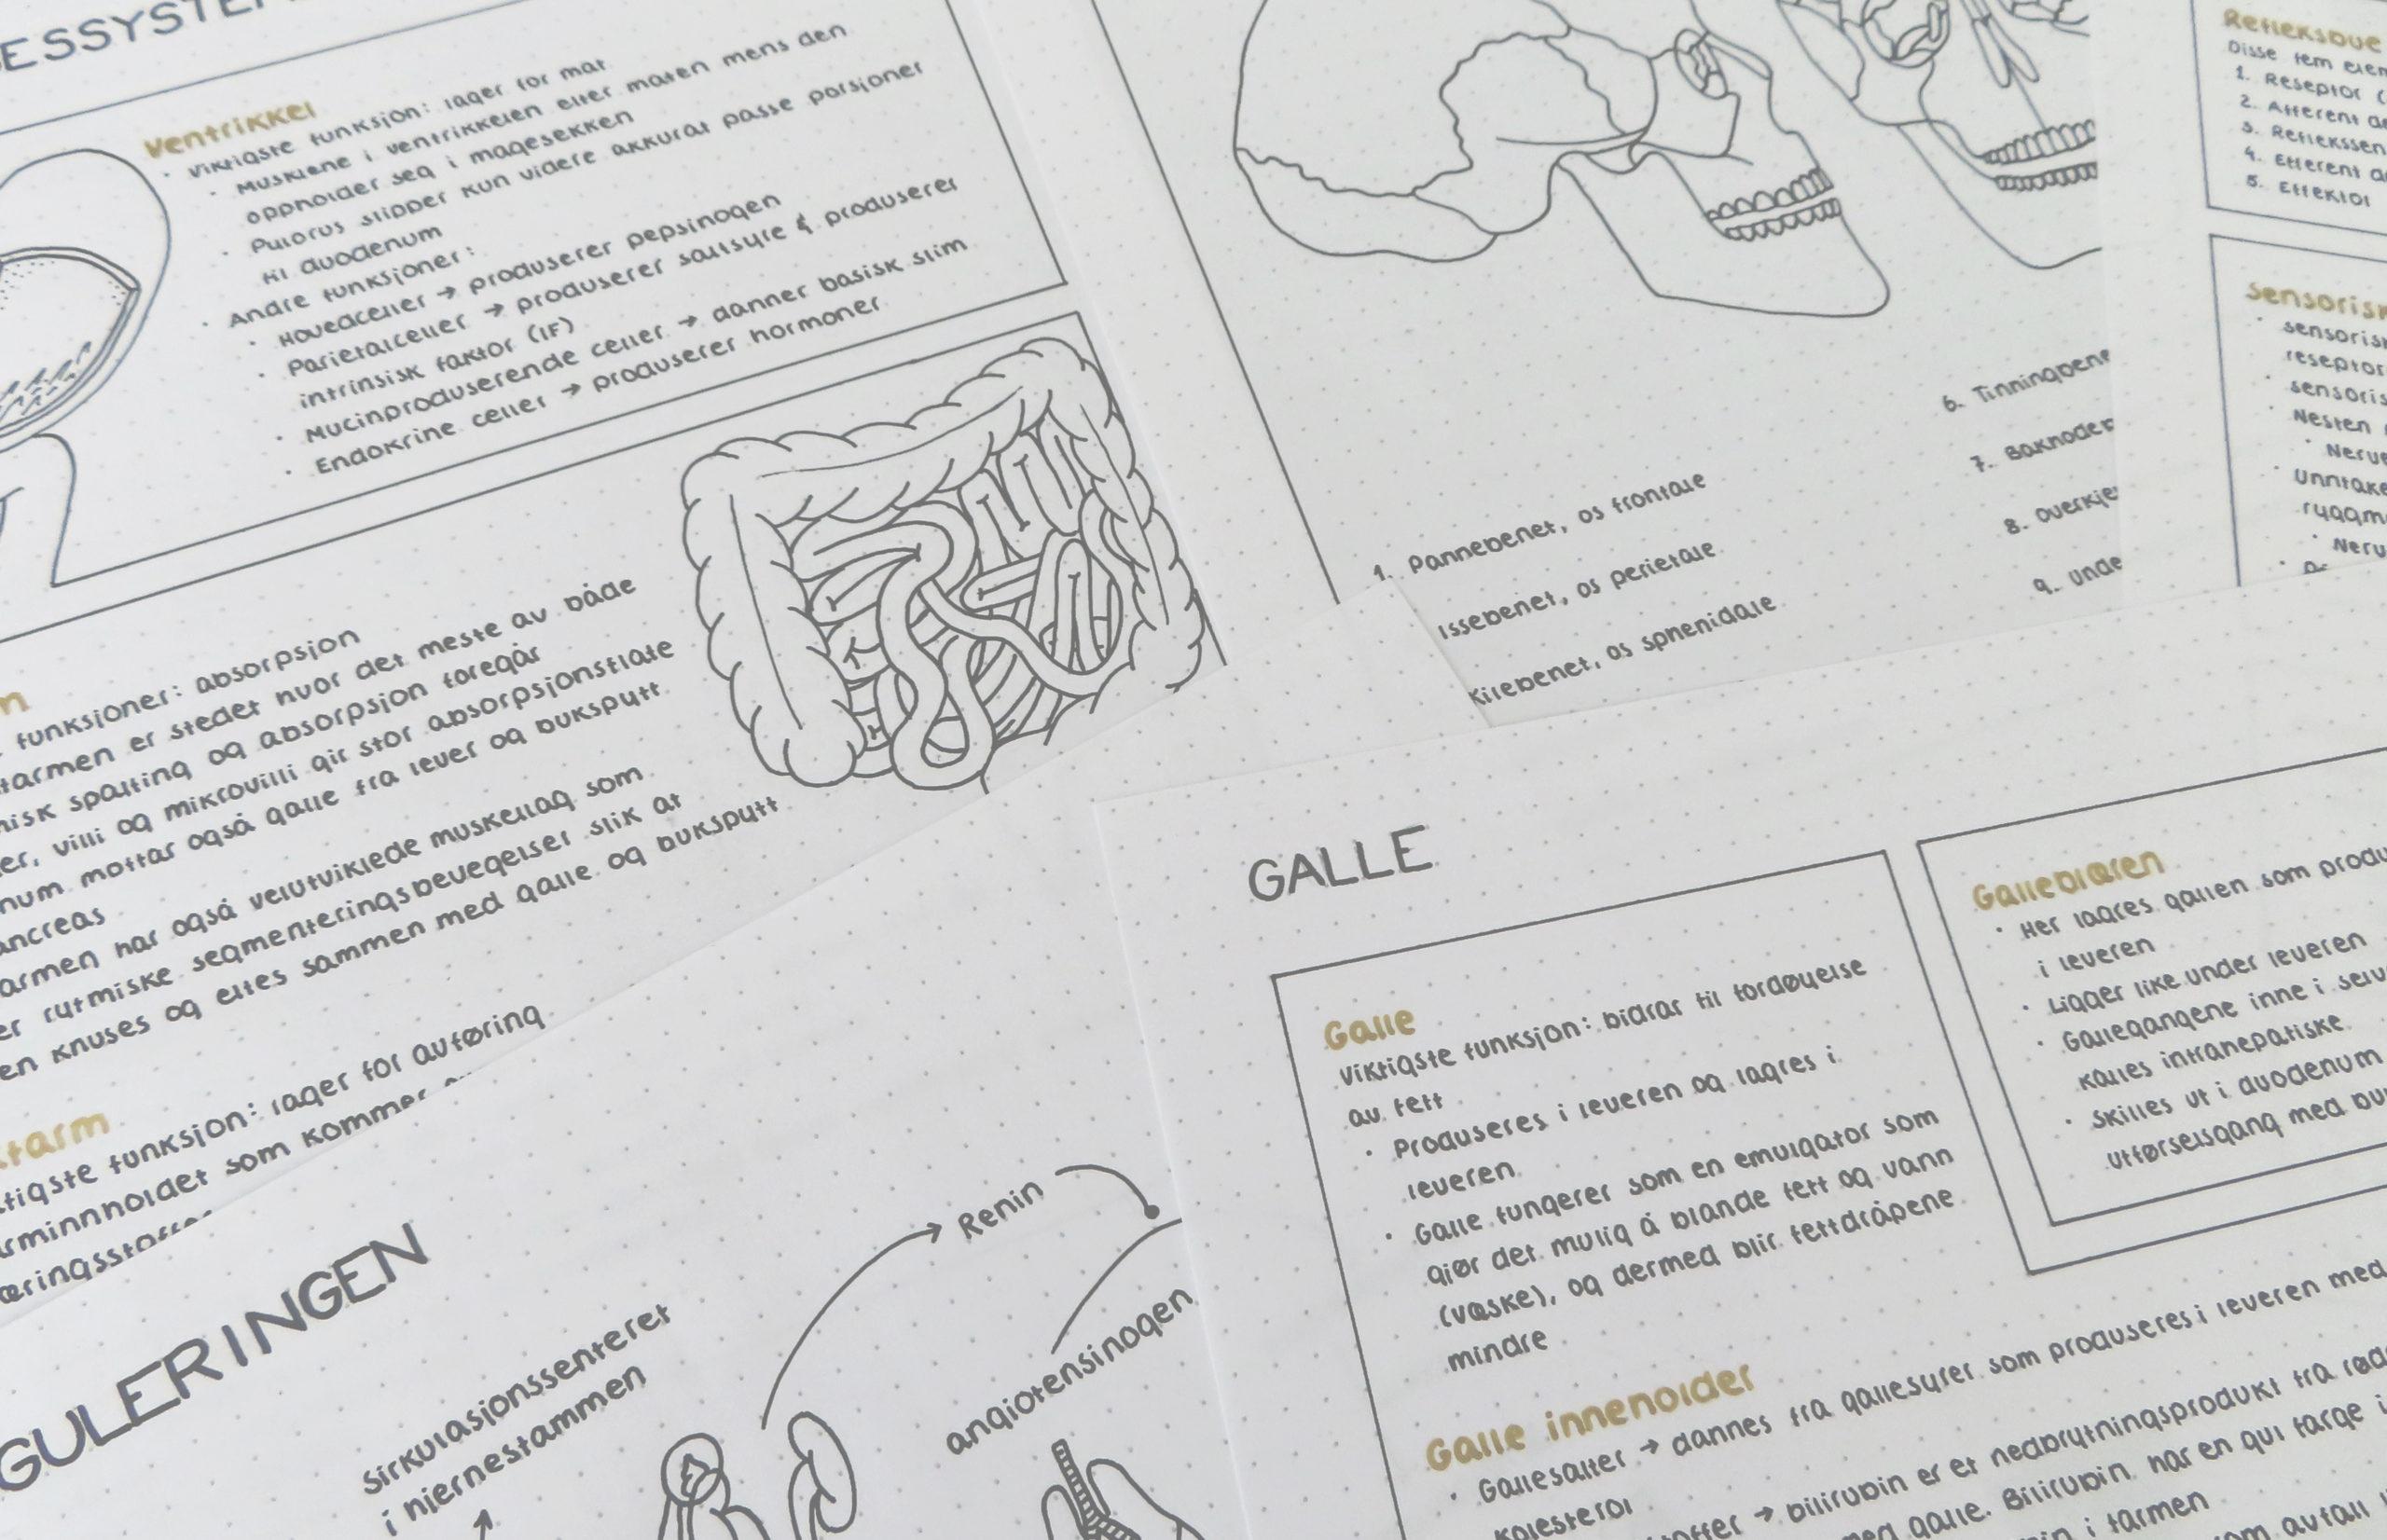 mari-johansen-Studietips-sykepleie-cingulum